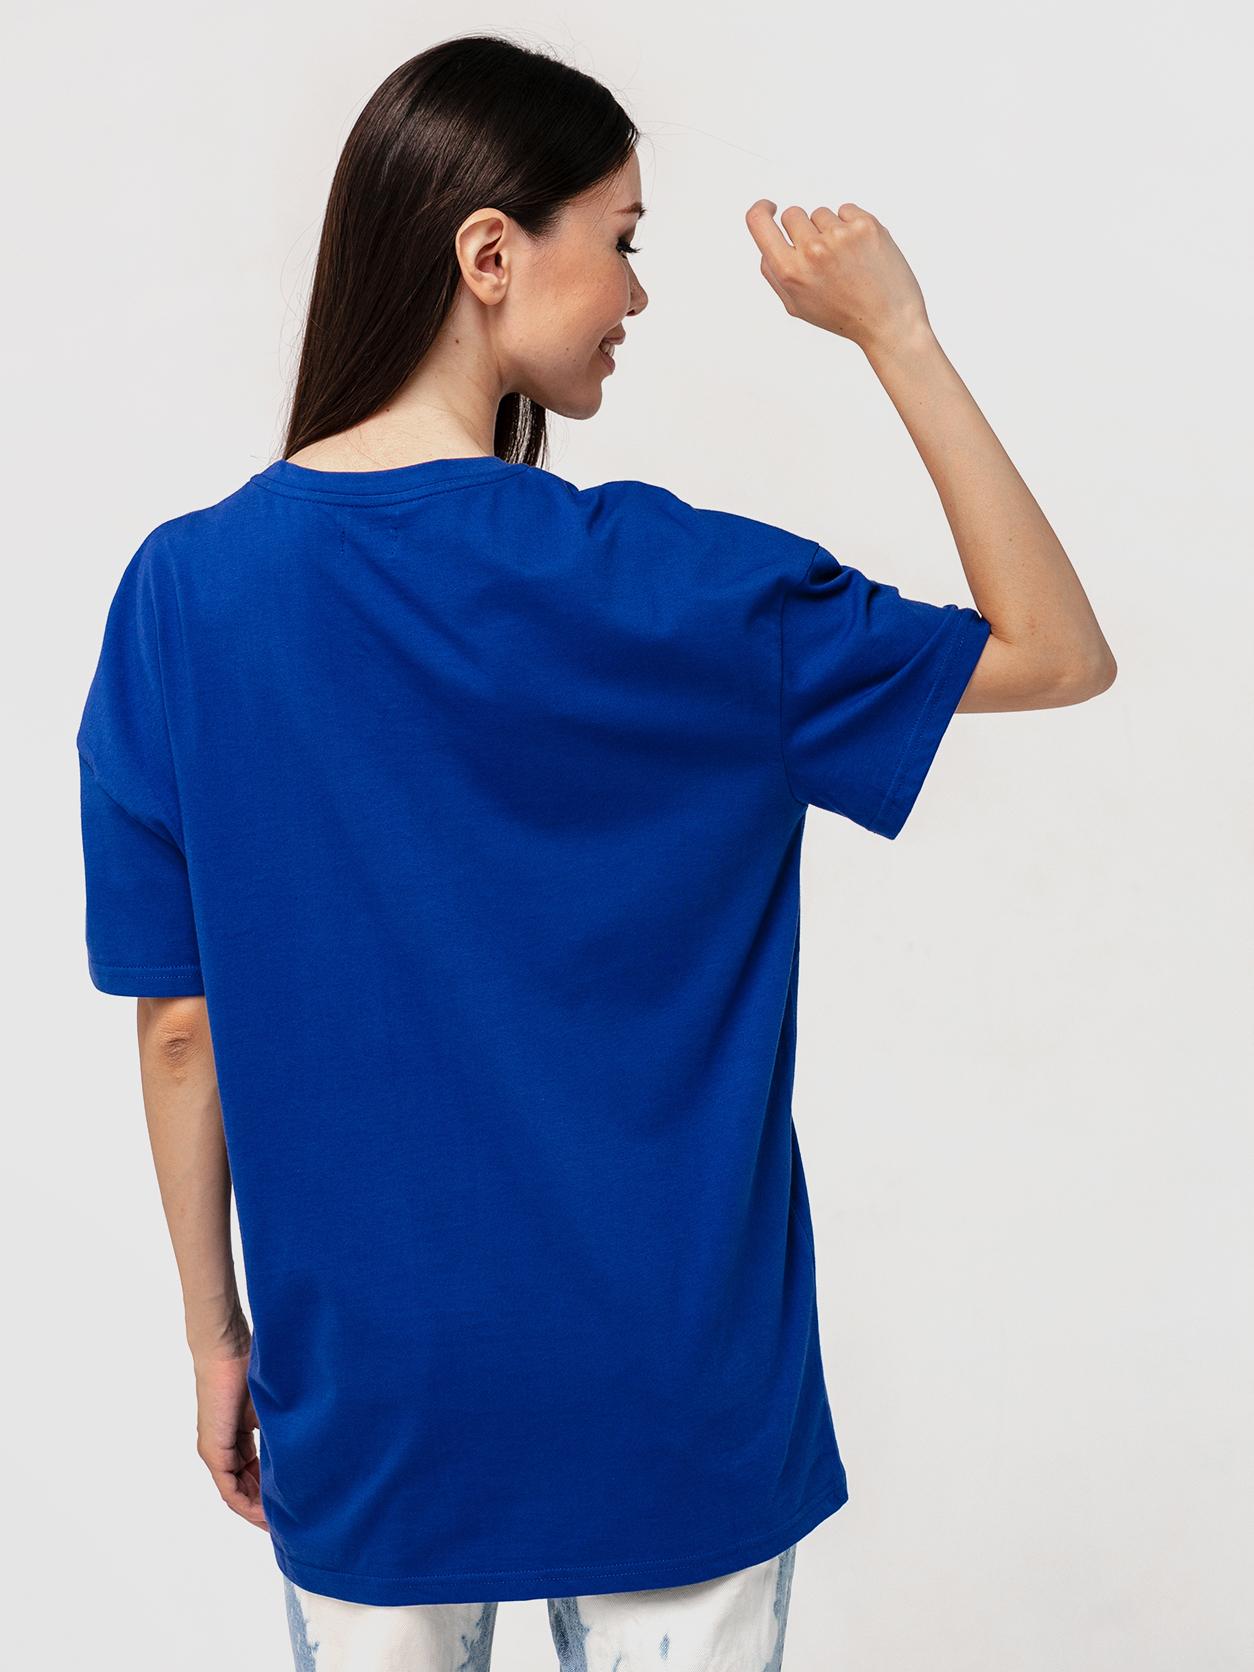 Футболка синяя YOS от украинского бренда Your Own Style